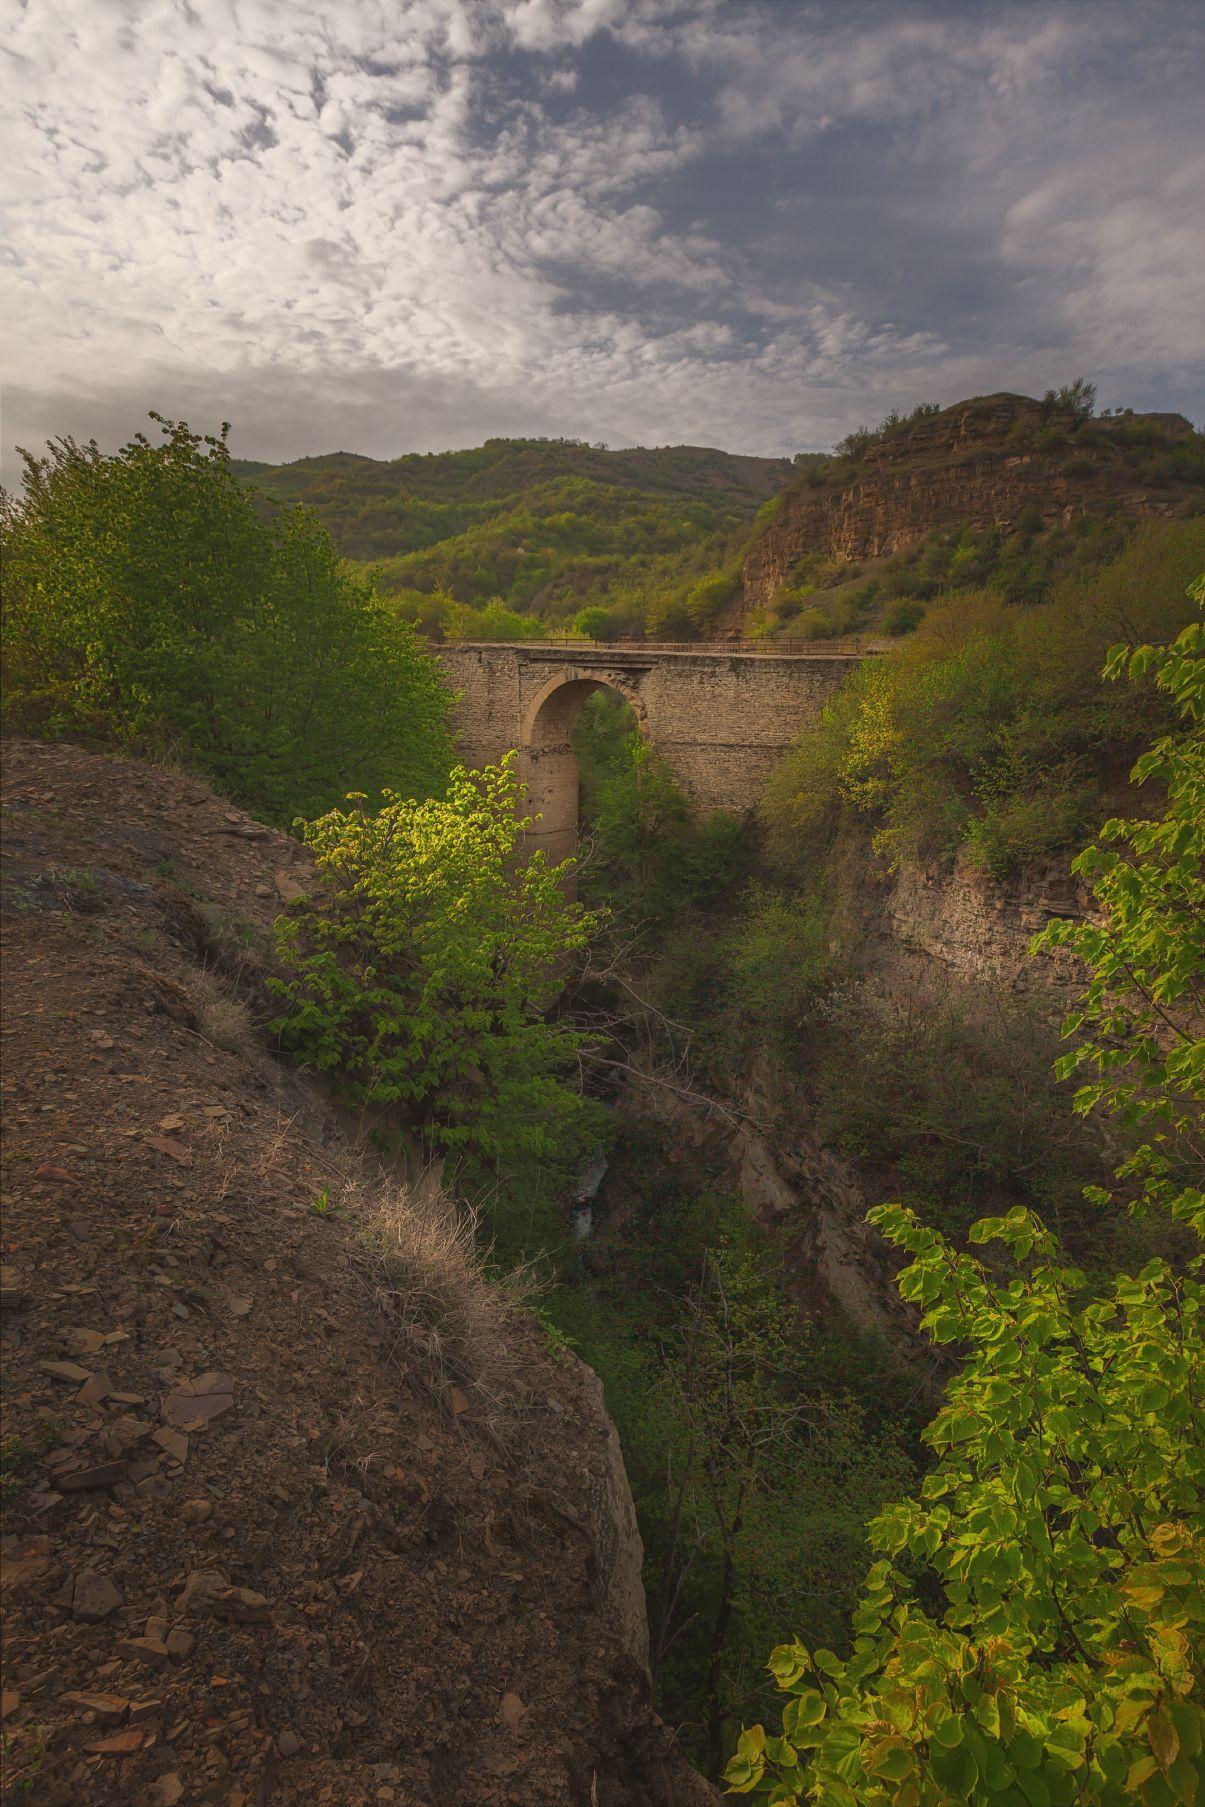 дагестан, мост, вечер, горы, Шишкин Дмитрий